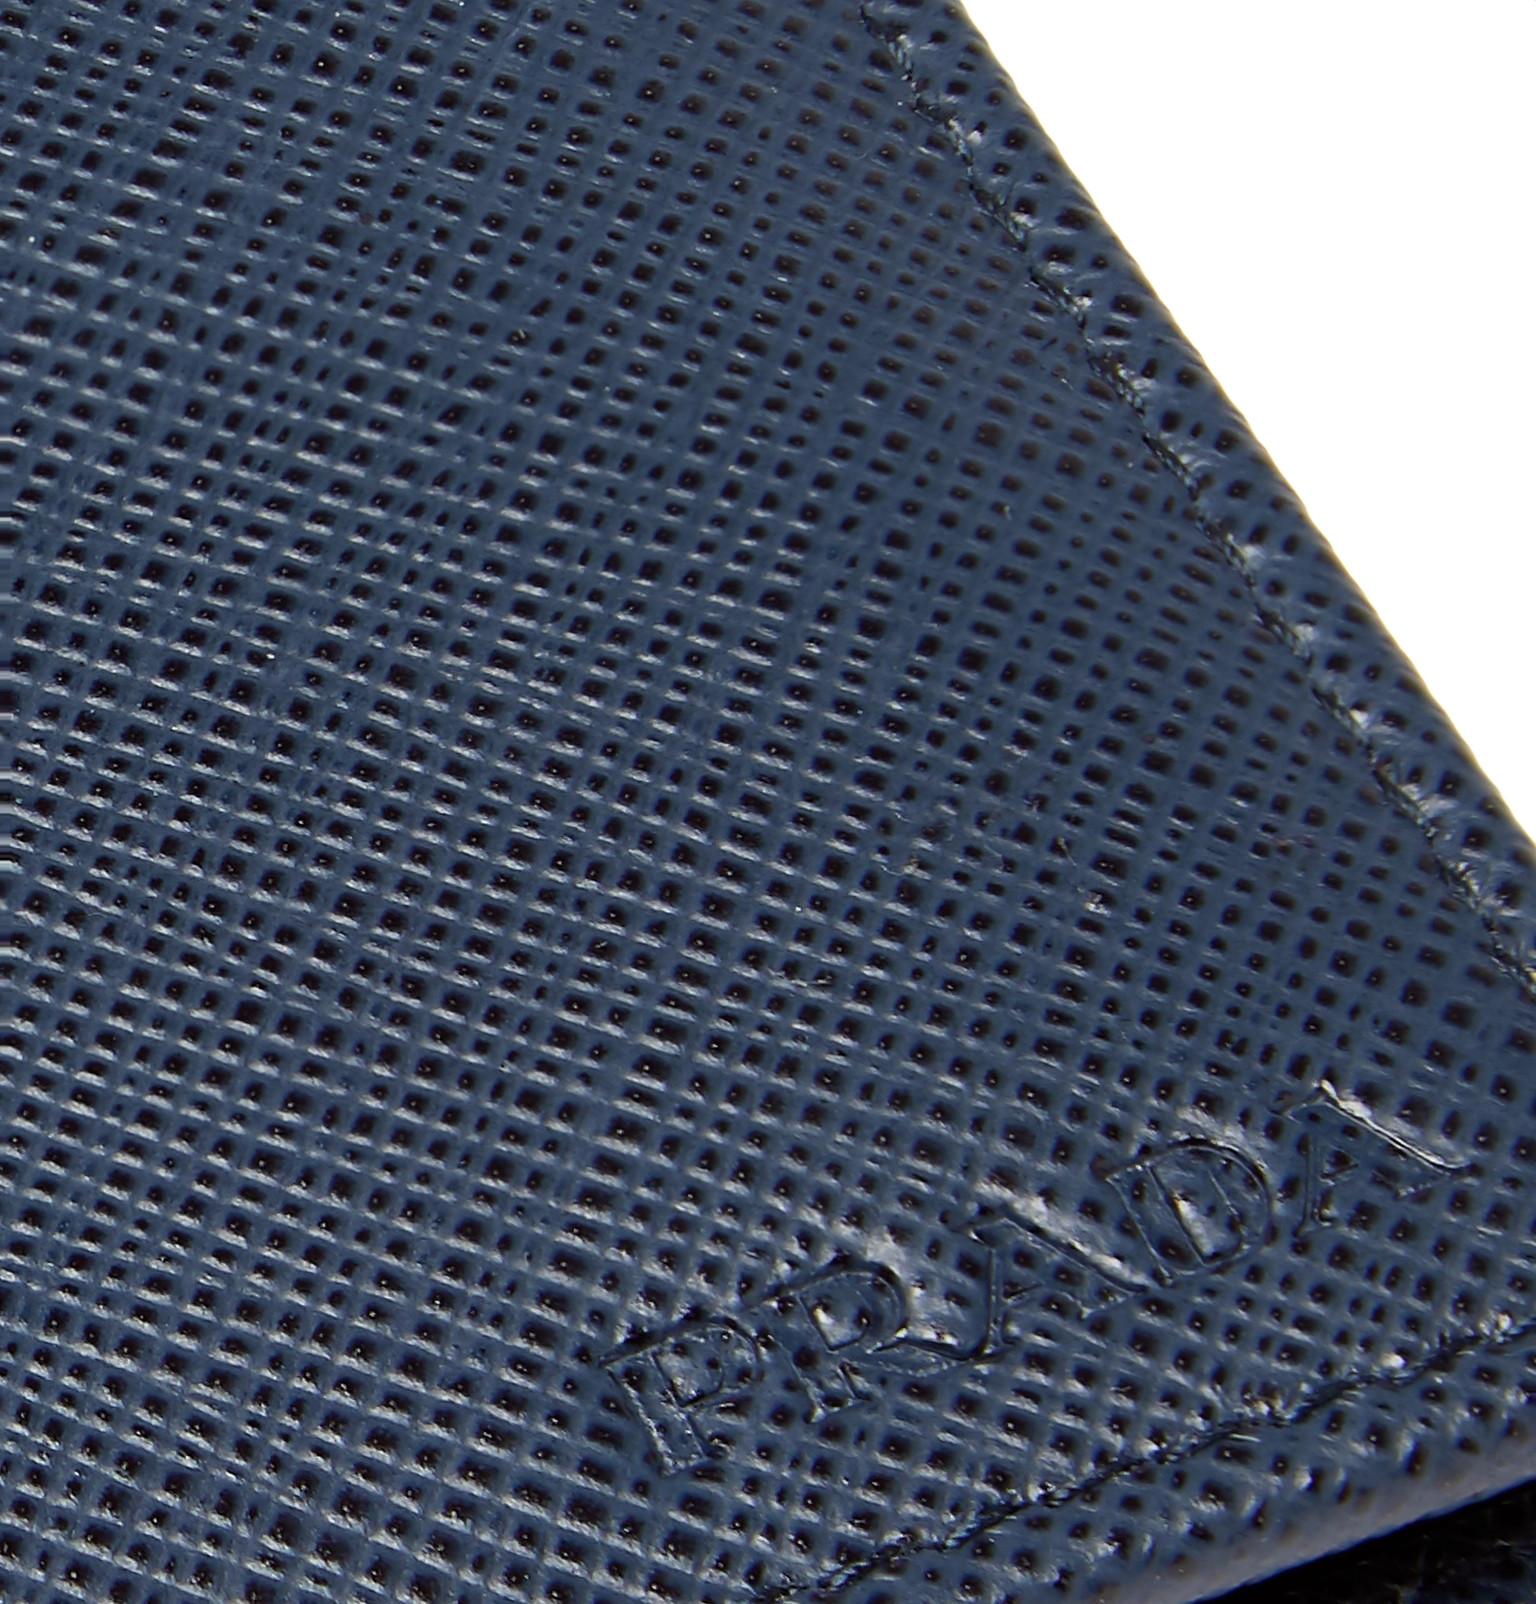 47145096cd0c Prada - Saffiano Leather Billfold Wallet